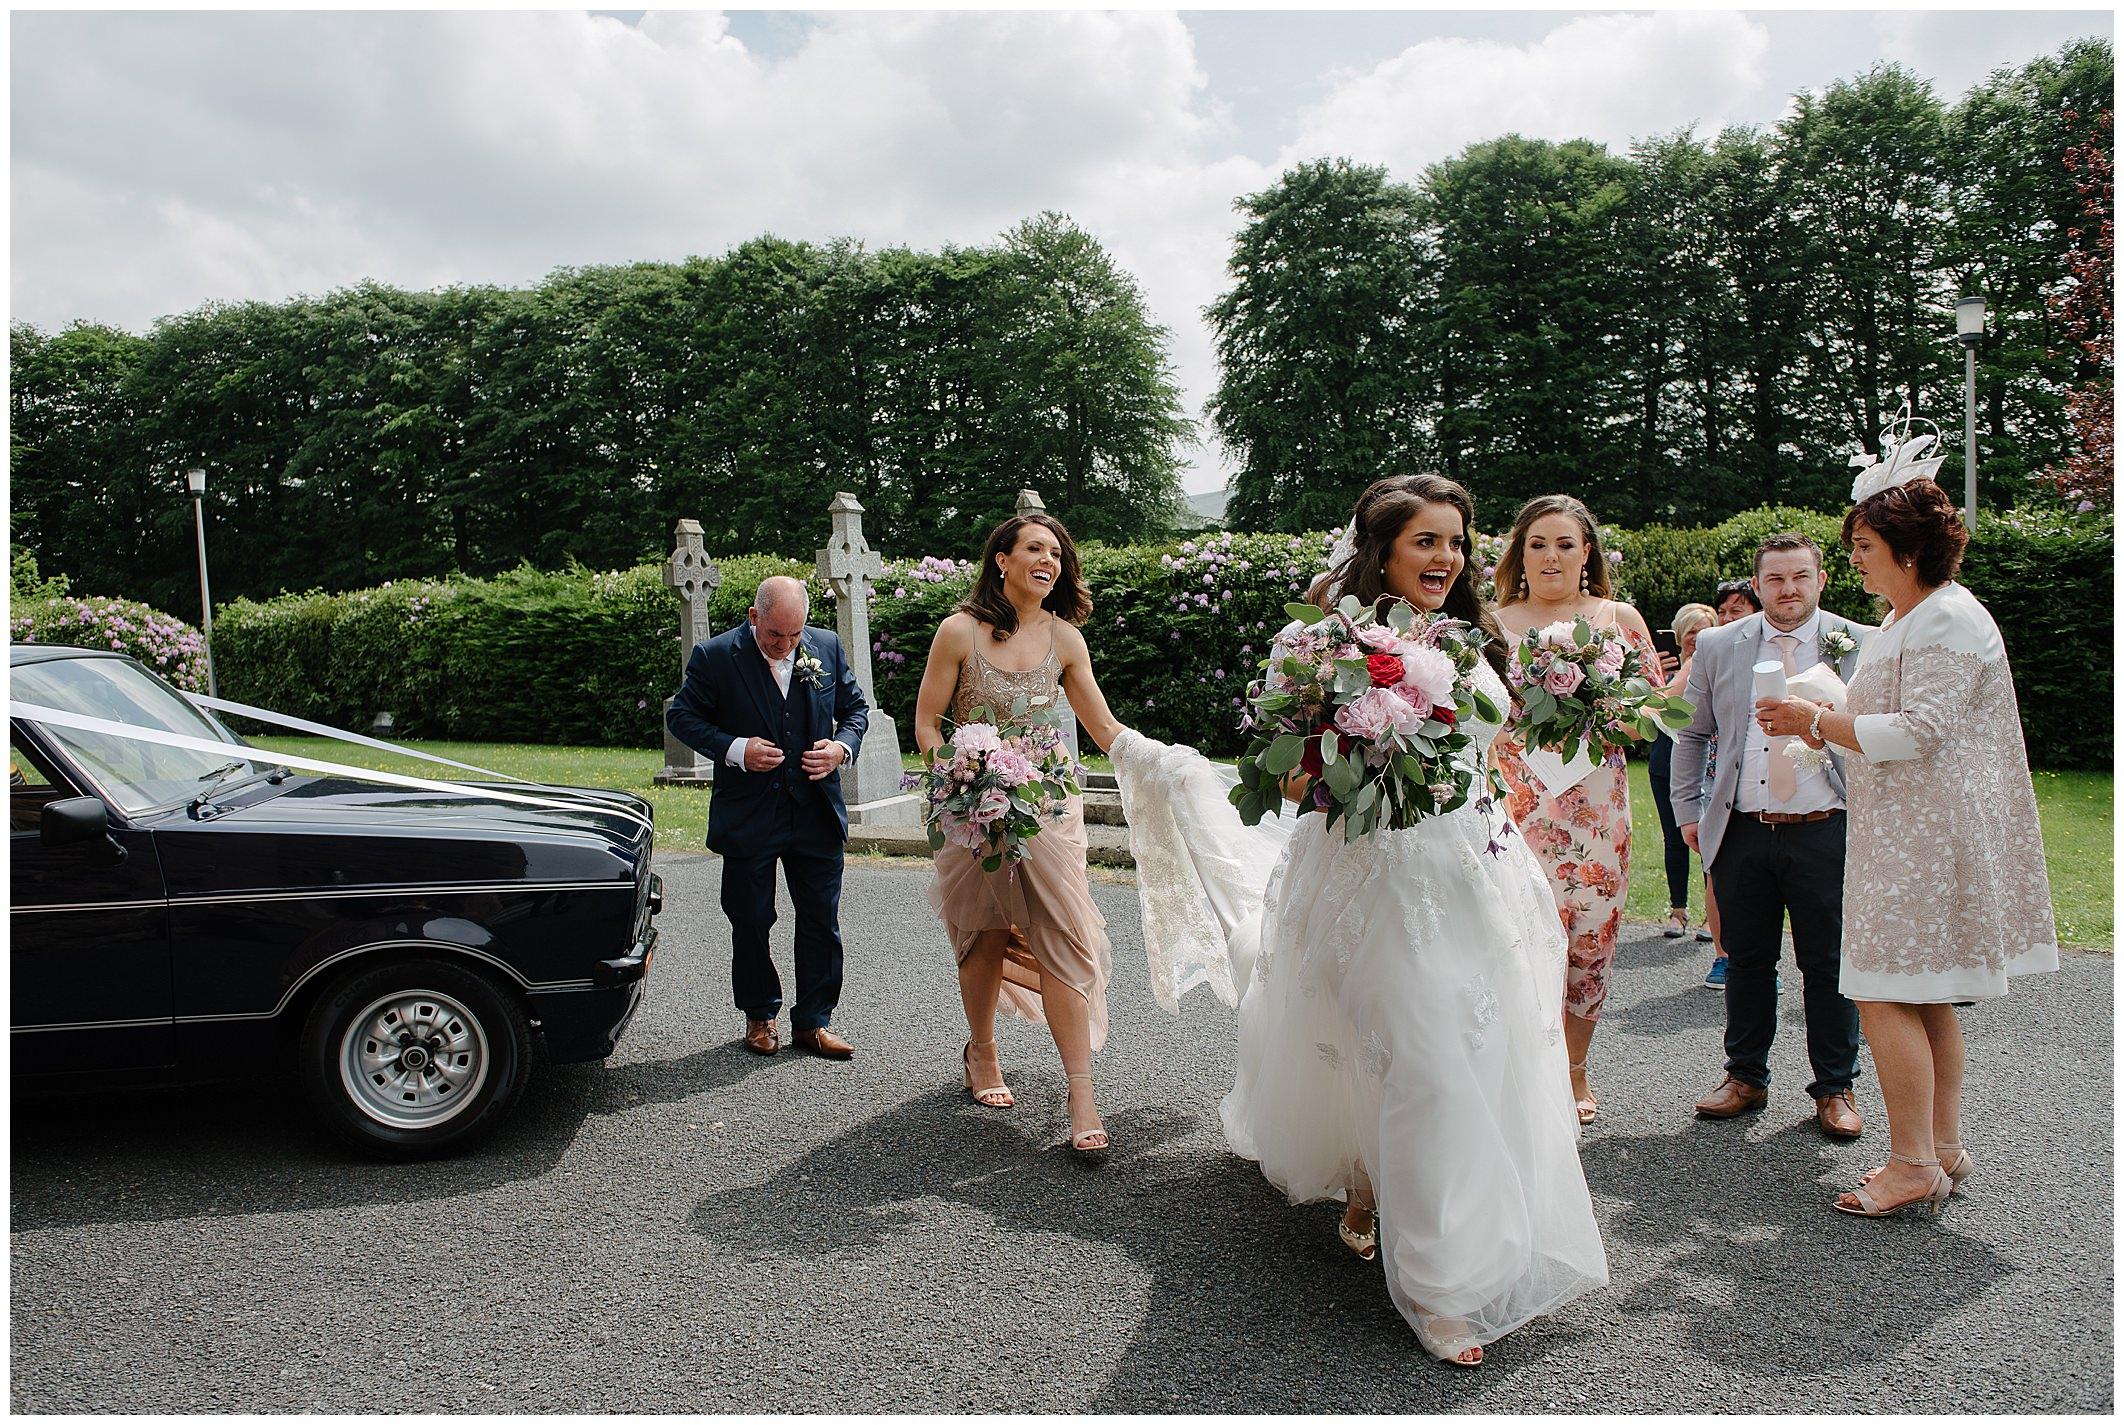 redcastle-hotel-wedding-karen-brian-jude-browne-photography-060.jpg